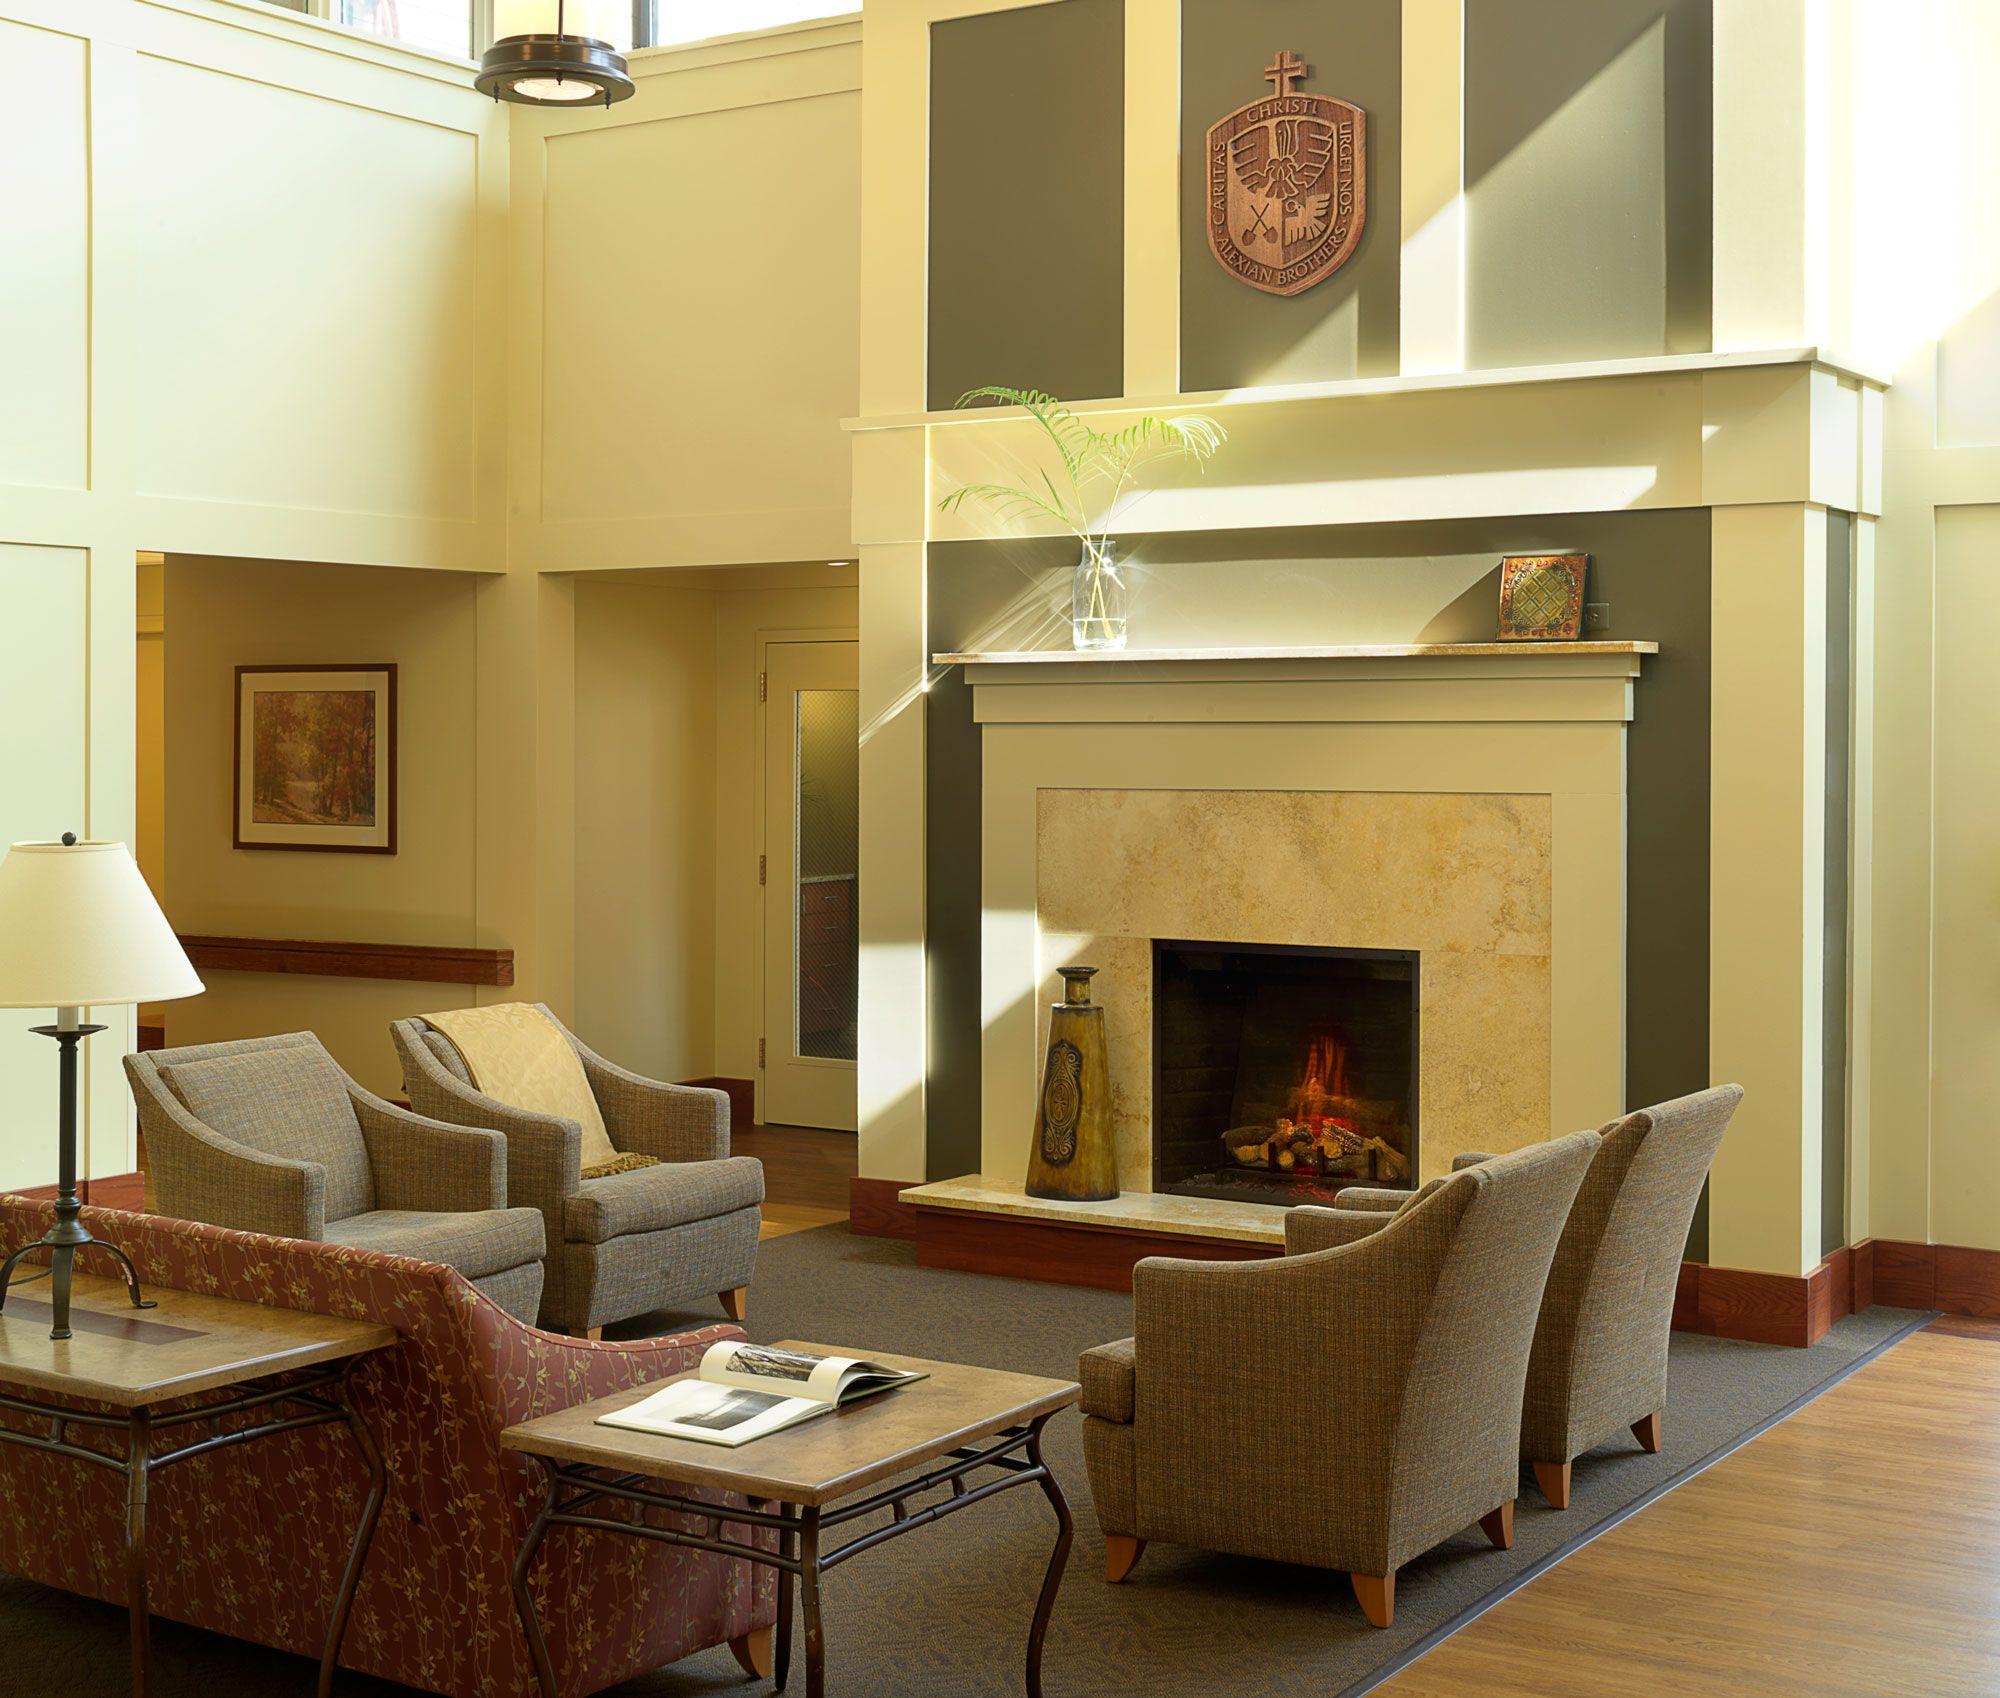 Interior Design Projects, Interior Design